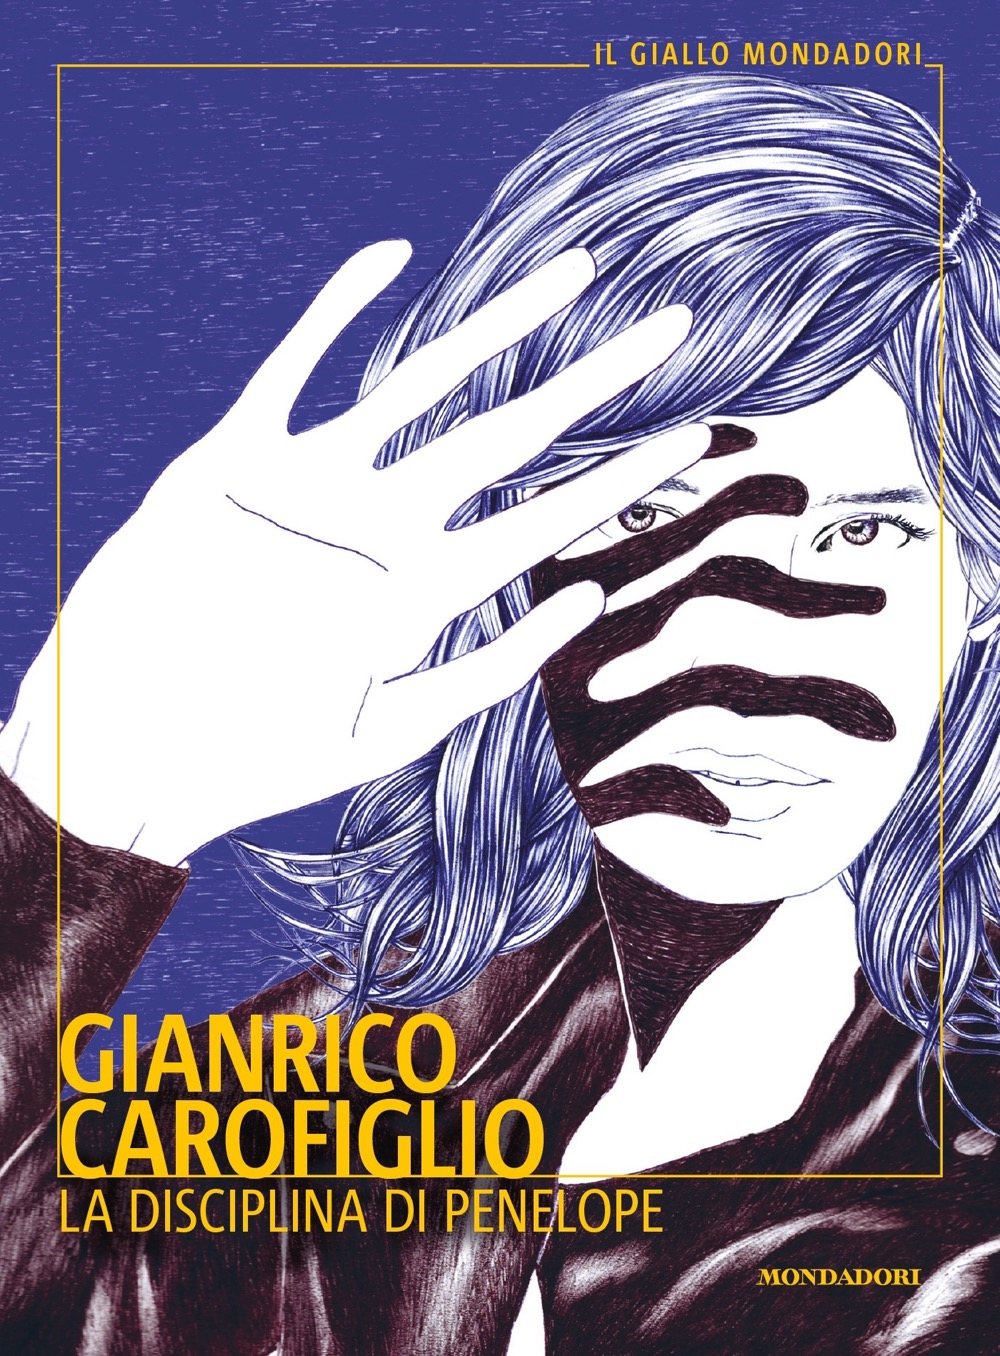 penelope_carofiglio